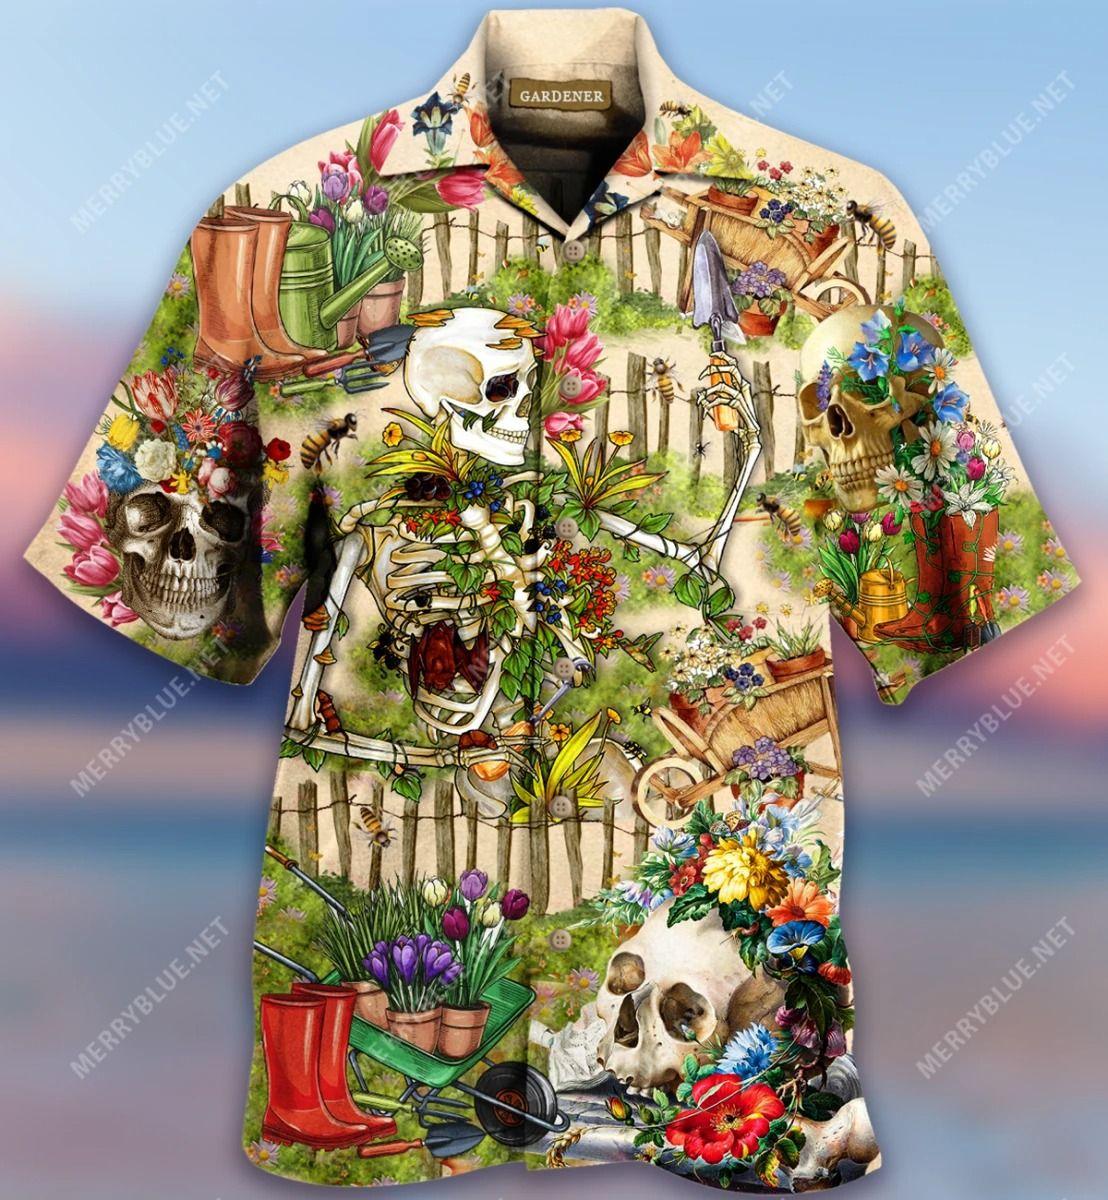 Gardening Saved Me From Being A Pornstar Now I'M Just A Gardener Hawaiian Shirt